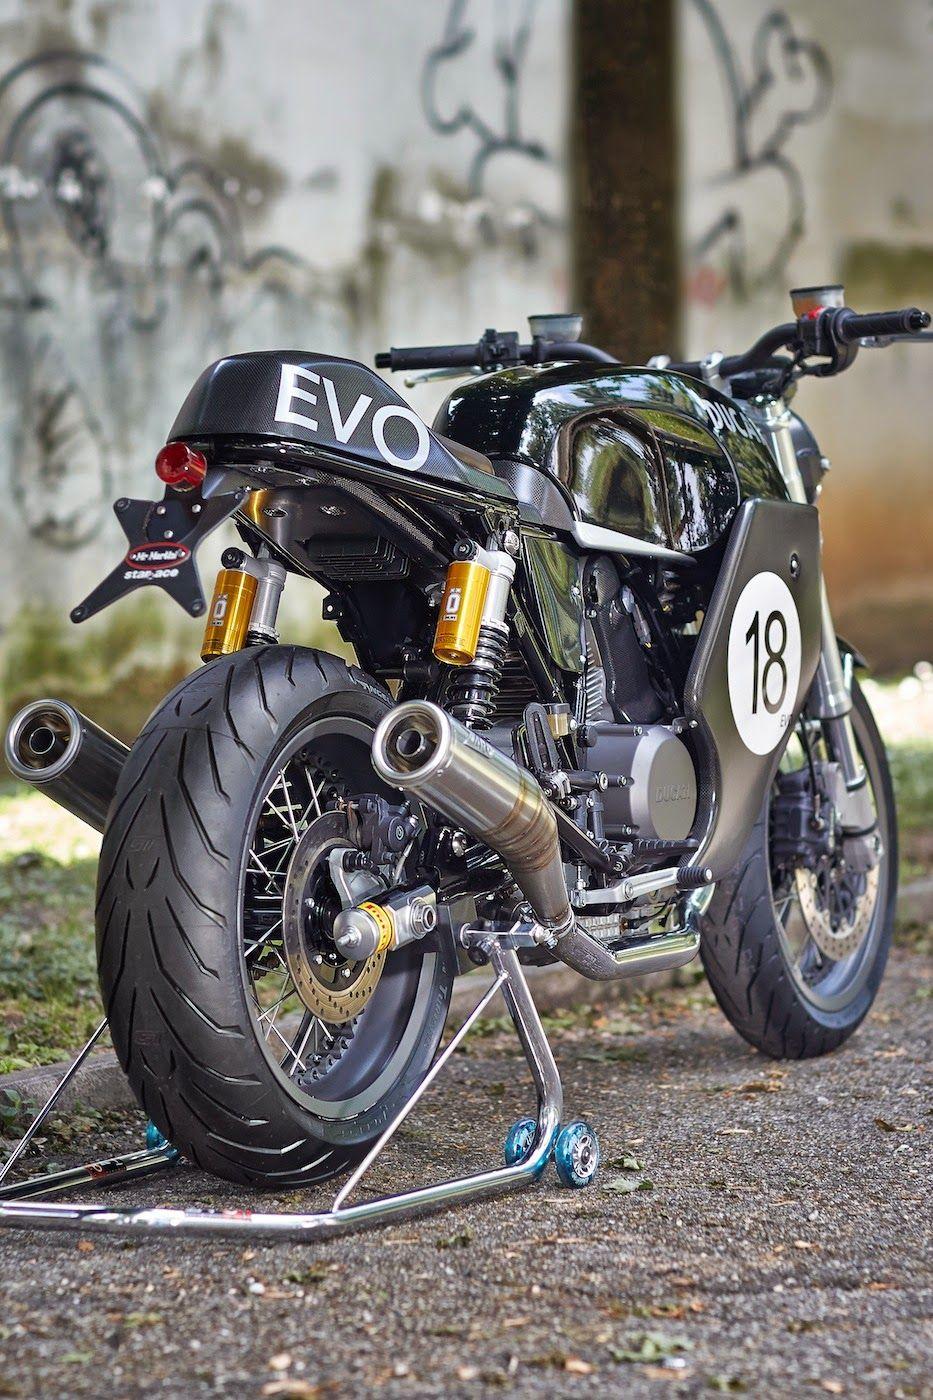 Ducati Gt1000 Cafe Racer Mr Martini Grease N Gasoline Cafe